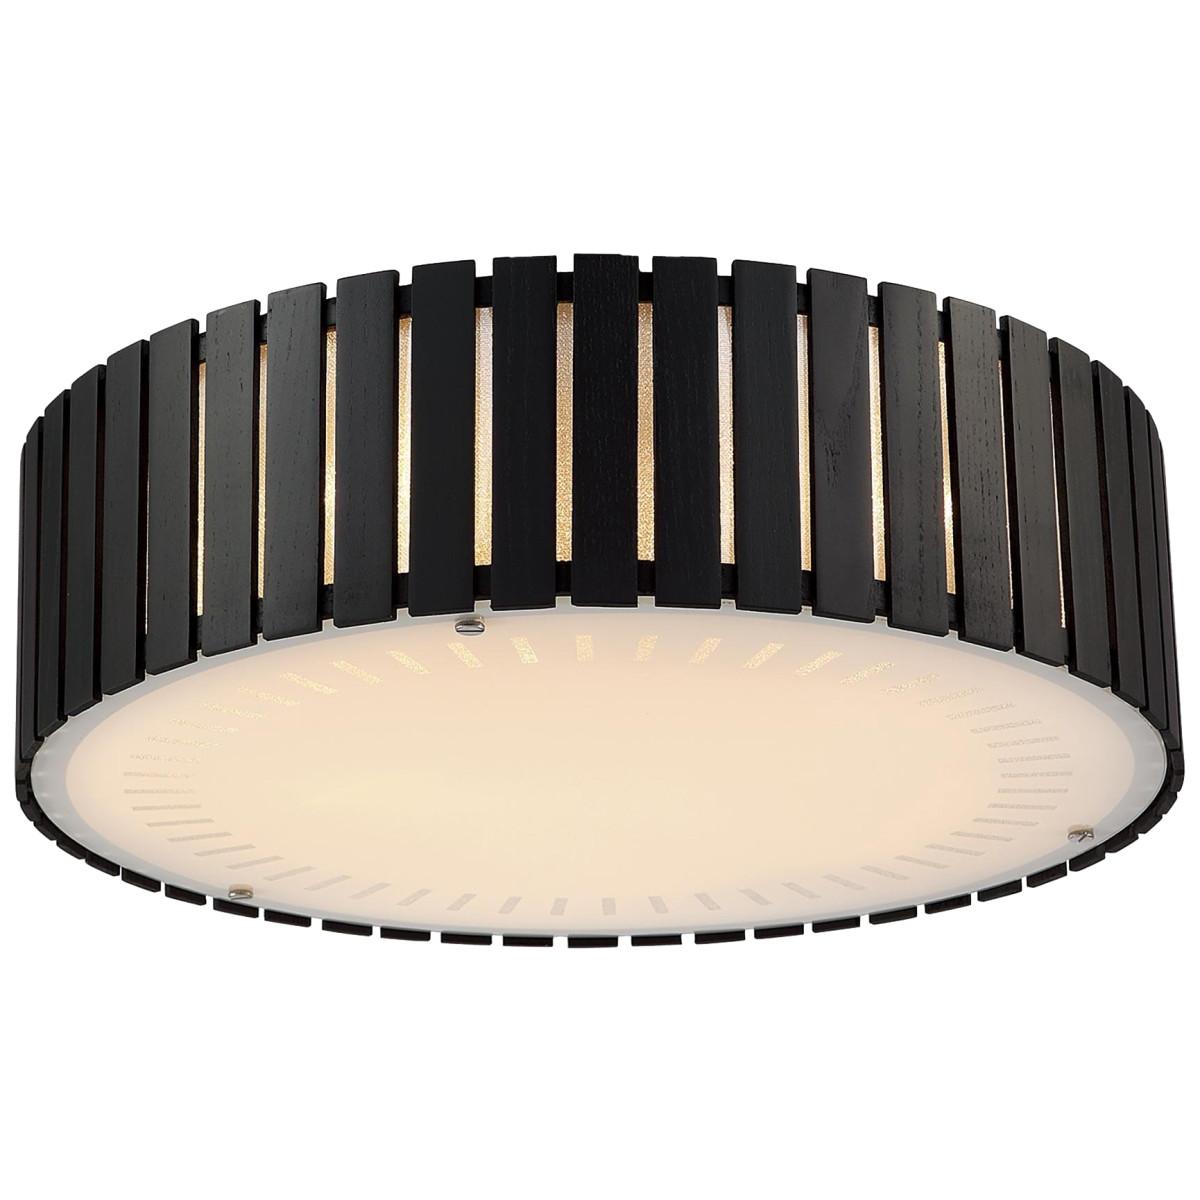 Люстра Citilux Ямато Cl137151 E27 5 Ламп 18 М²